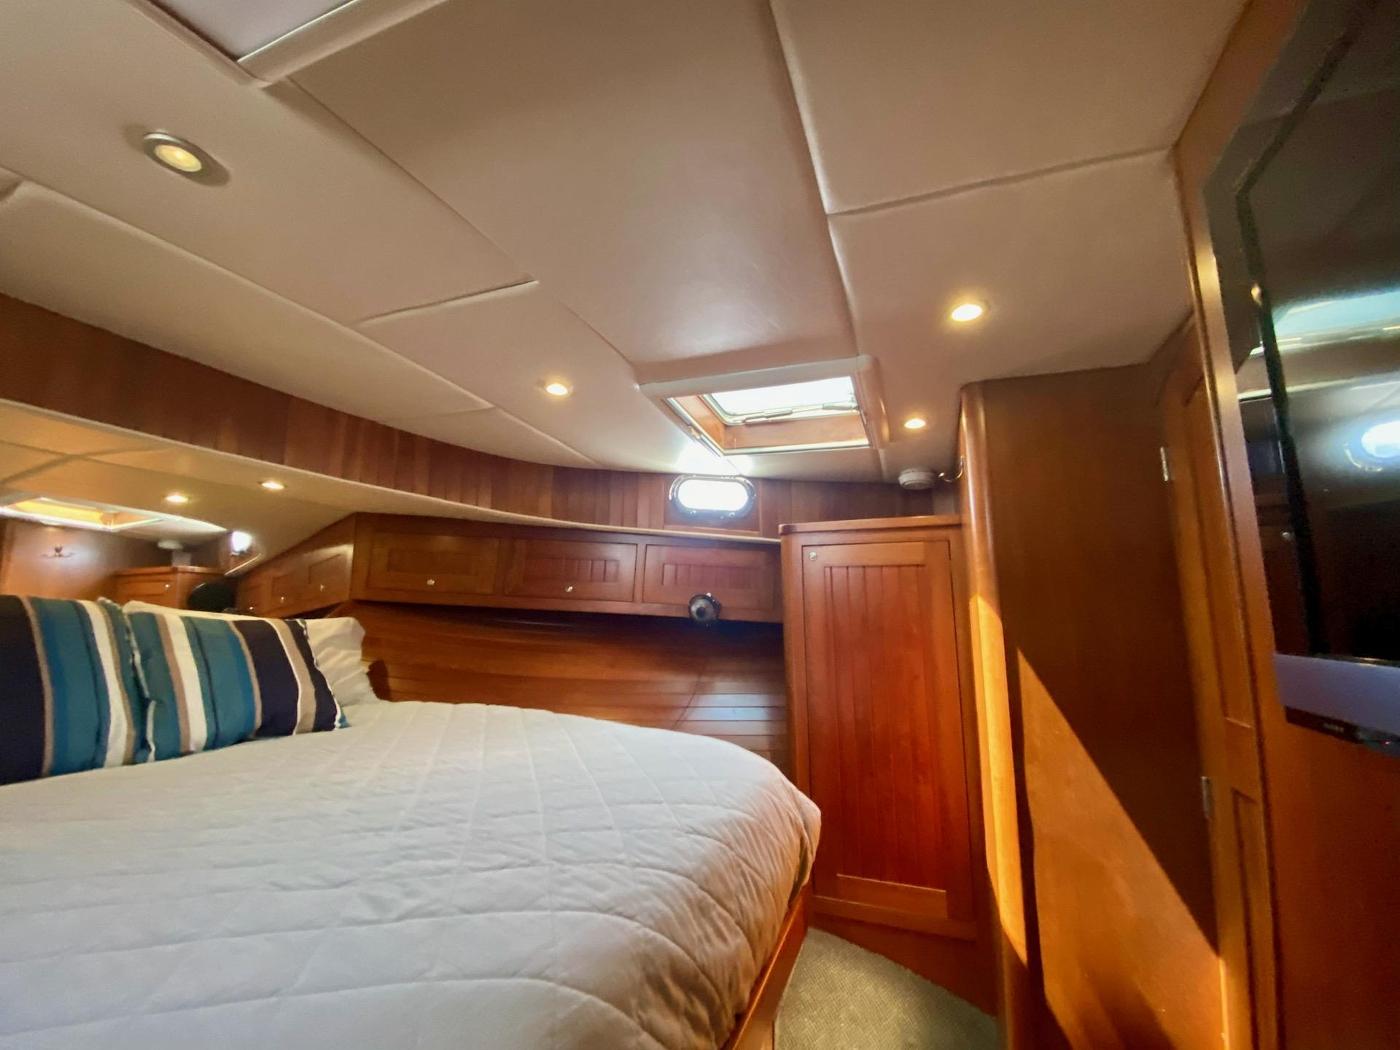 2010 Bracewell 41, Forward Cabin 7